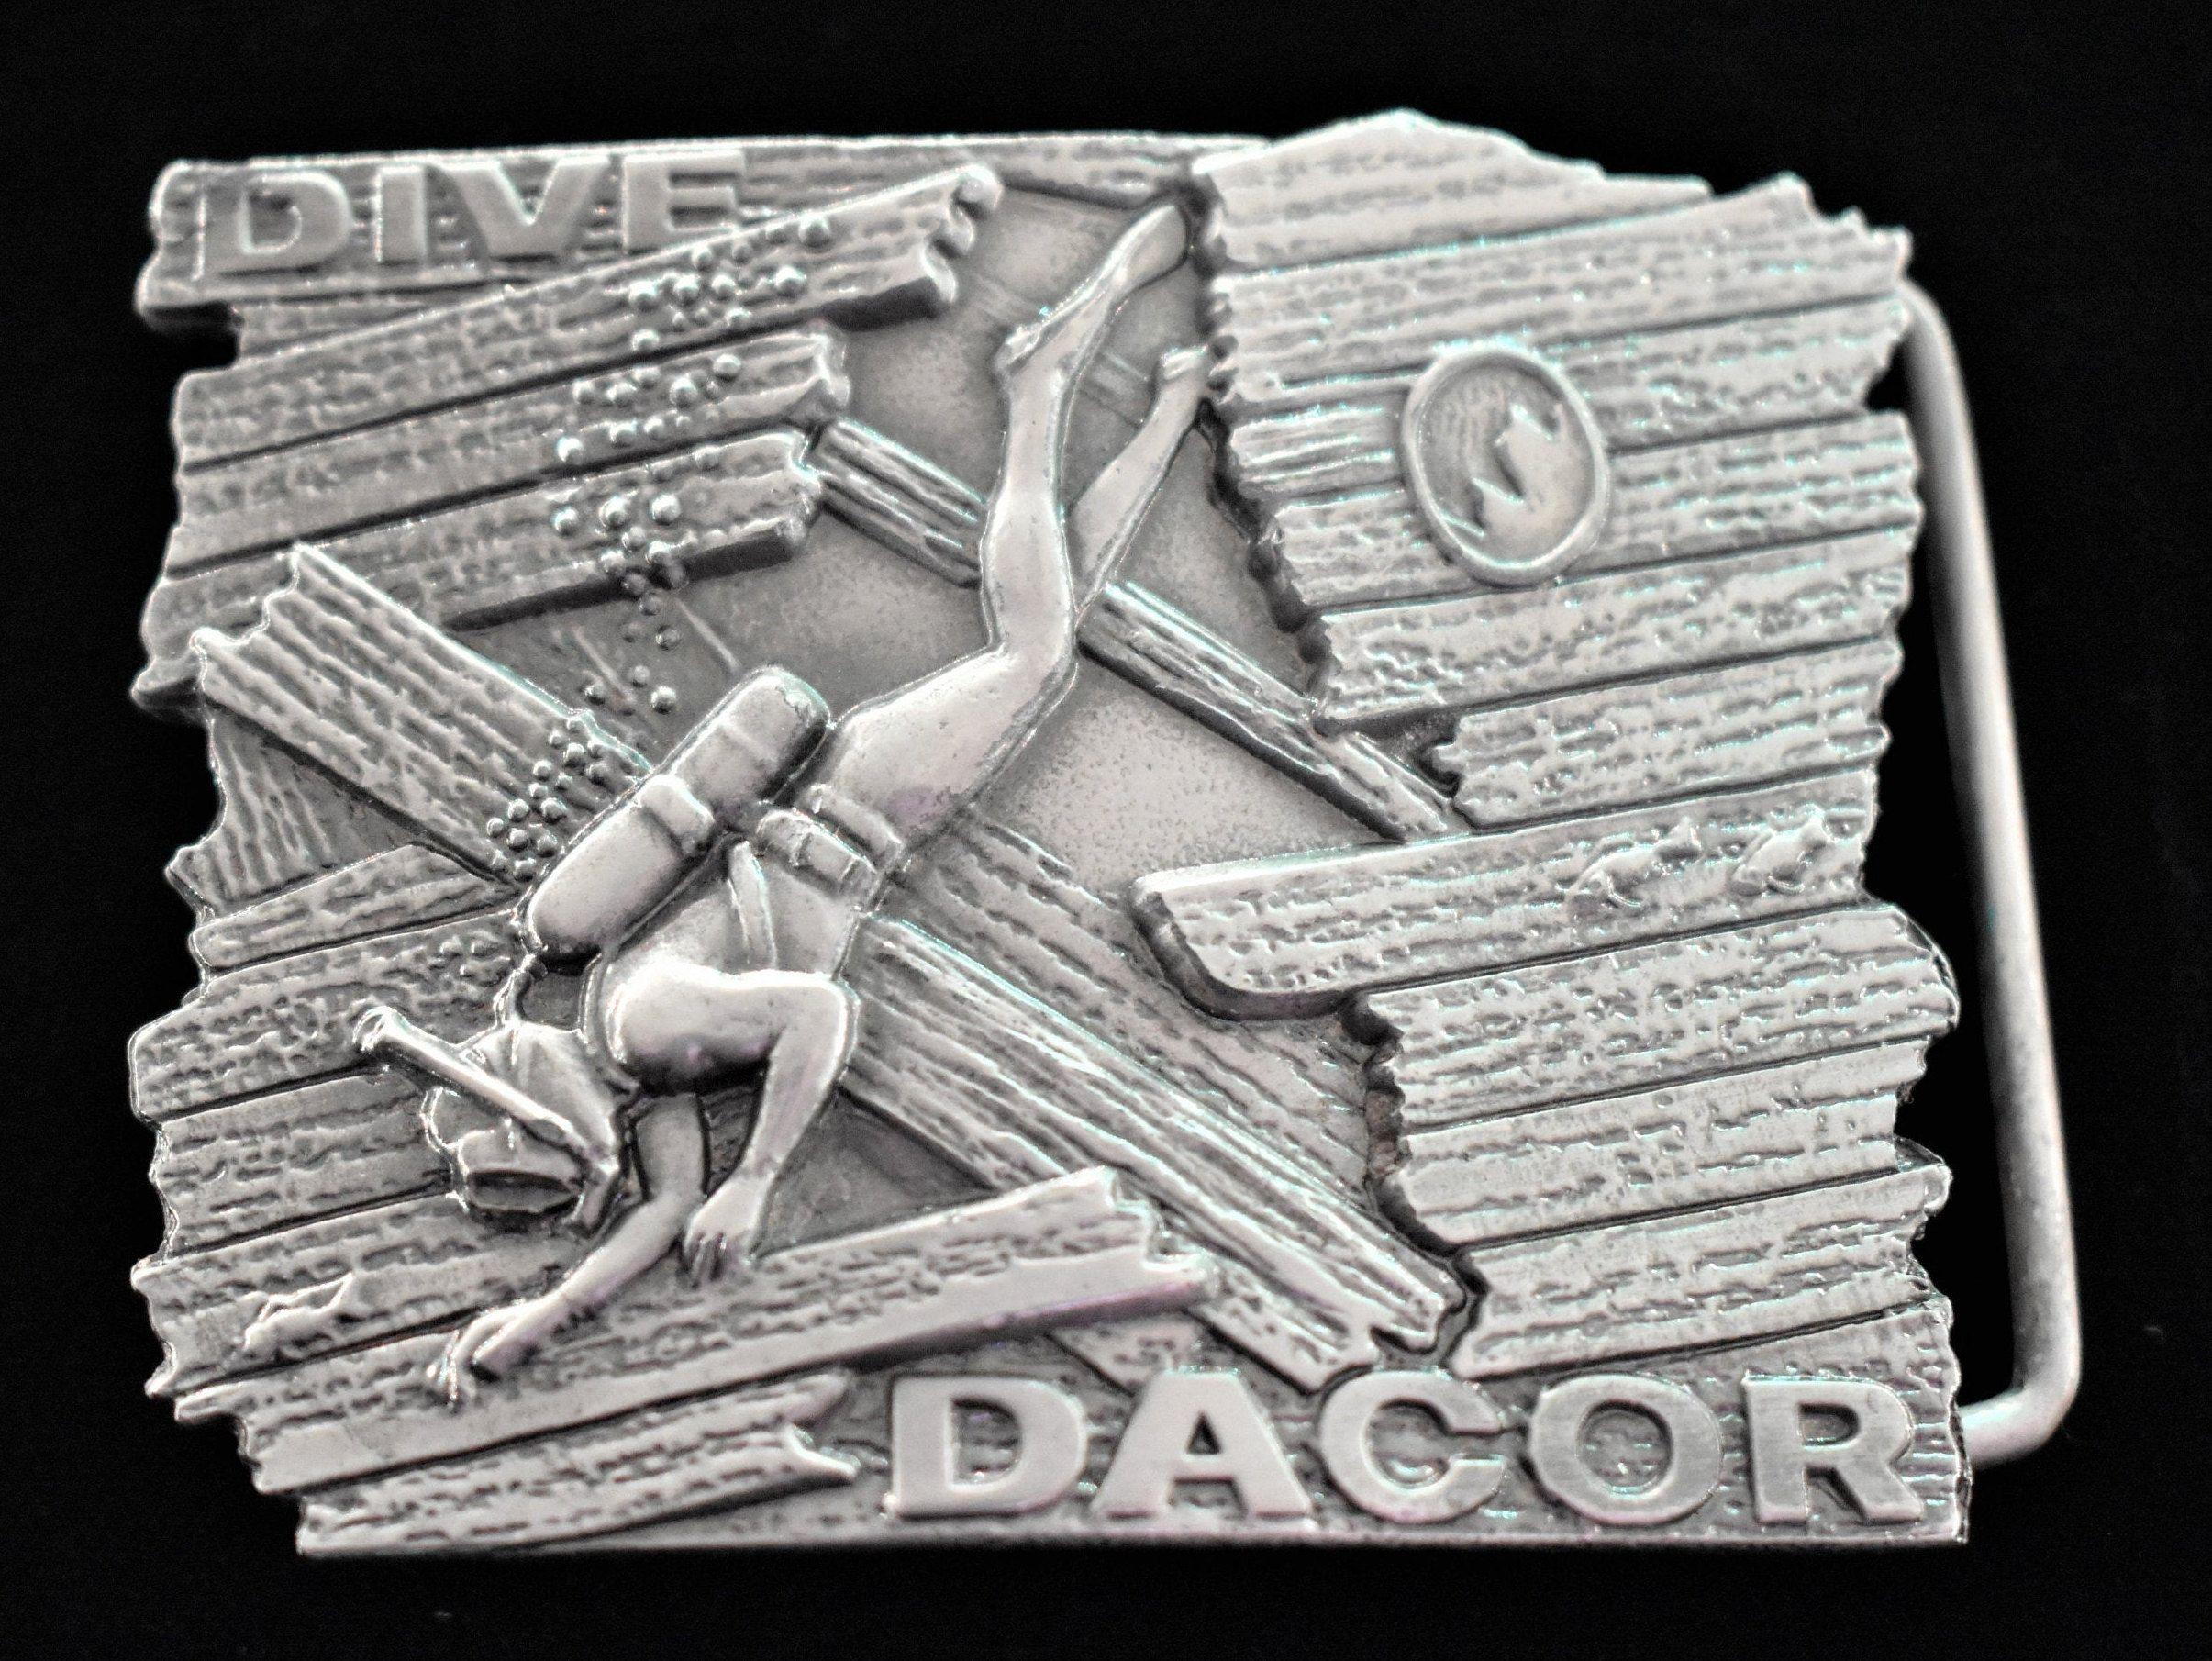 Dacor Diving Gear Equipment Scuba Diver Vintage Belt Buckle Etsy Vintage Belt Buckles Belt Buckles Diving Gear